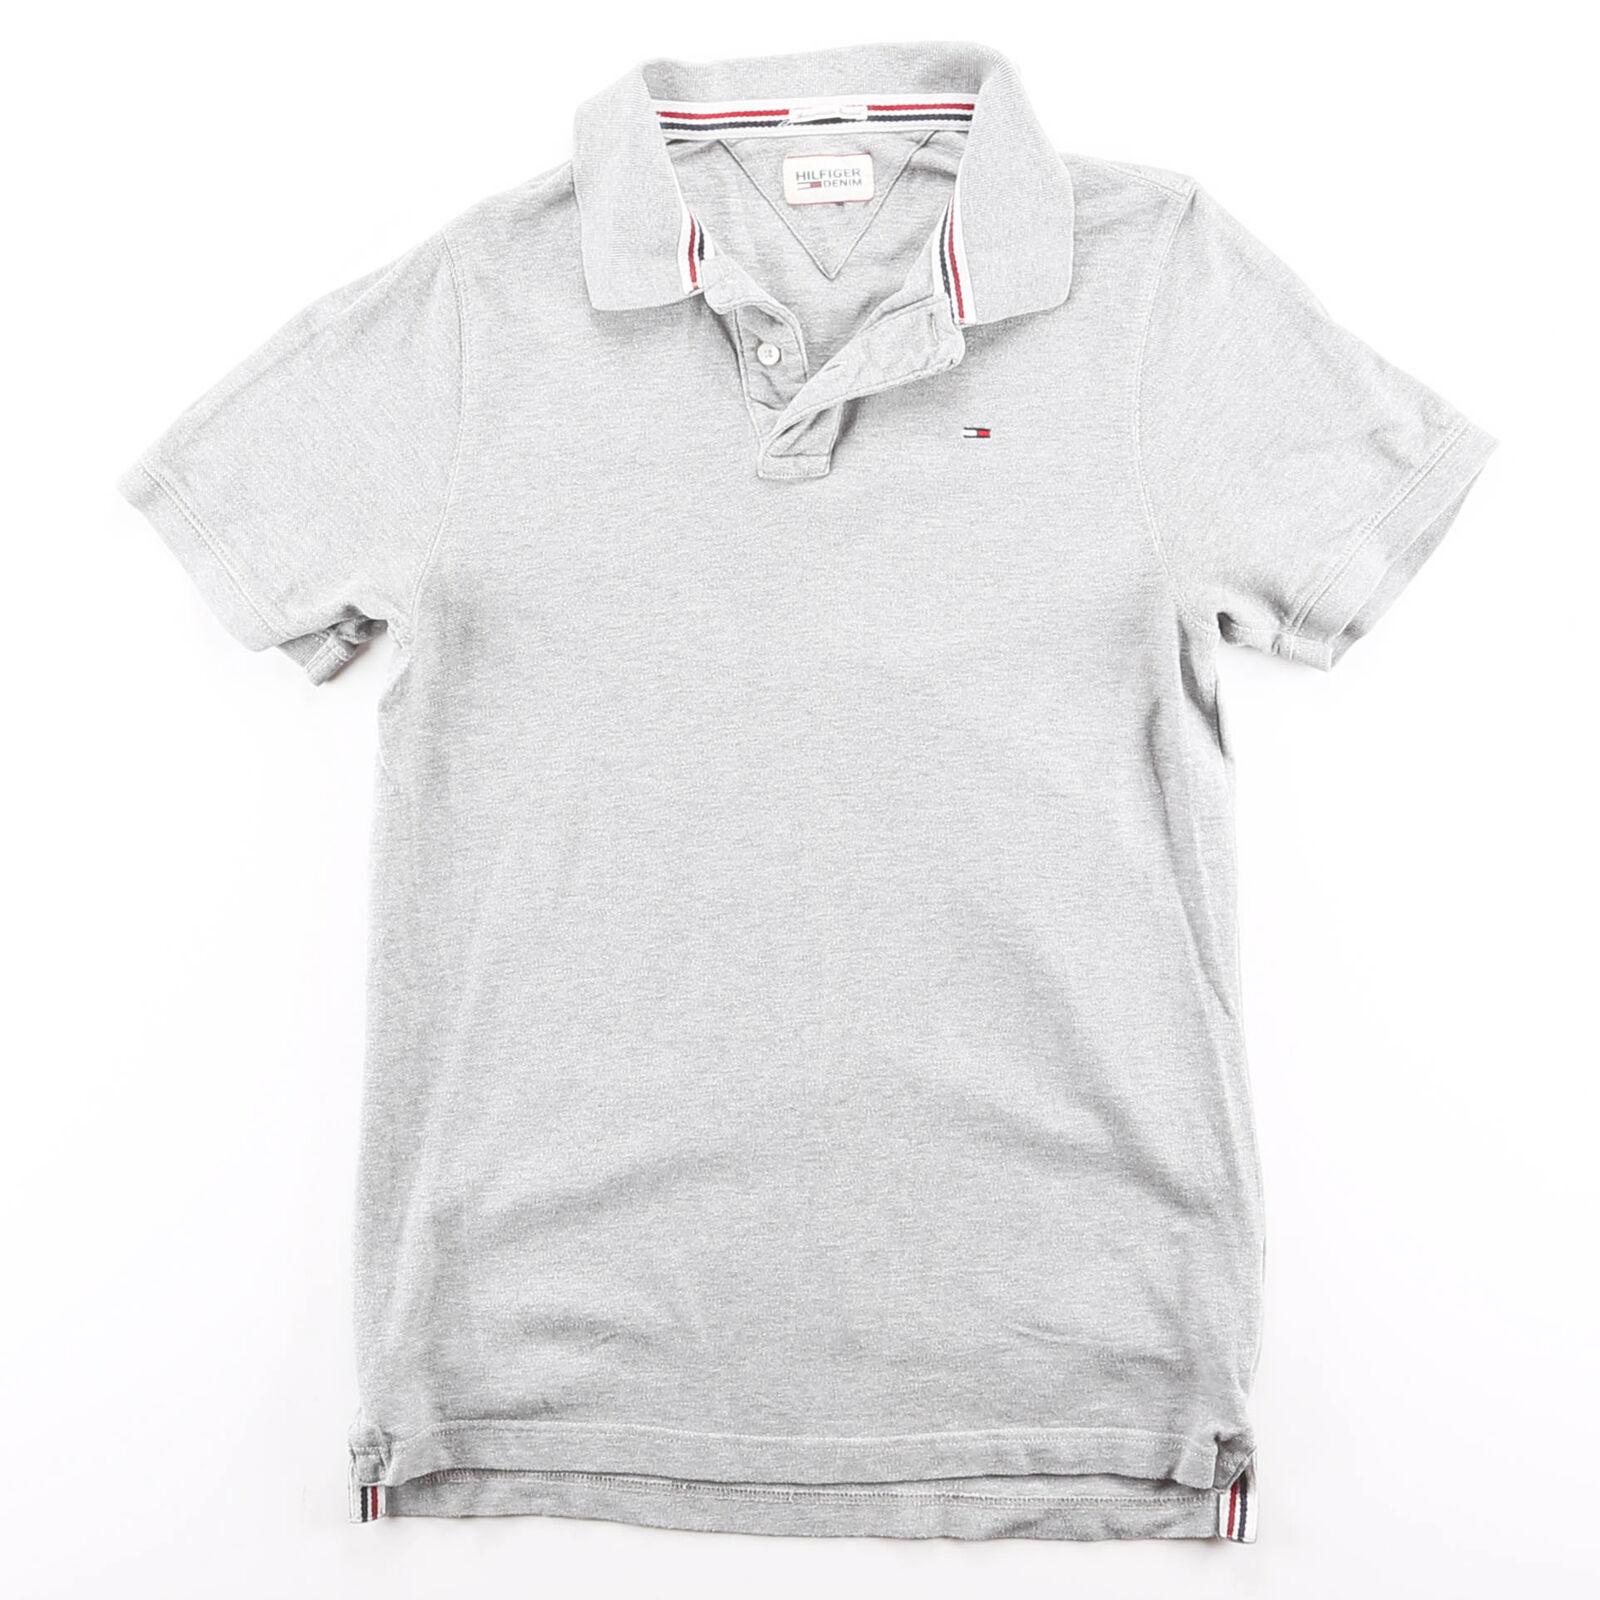 TOMMY HILFIGER Grey 00s Short Sleeve Polo Shirt M